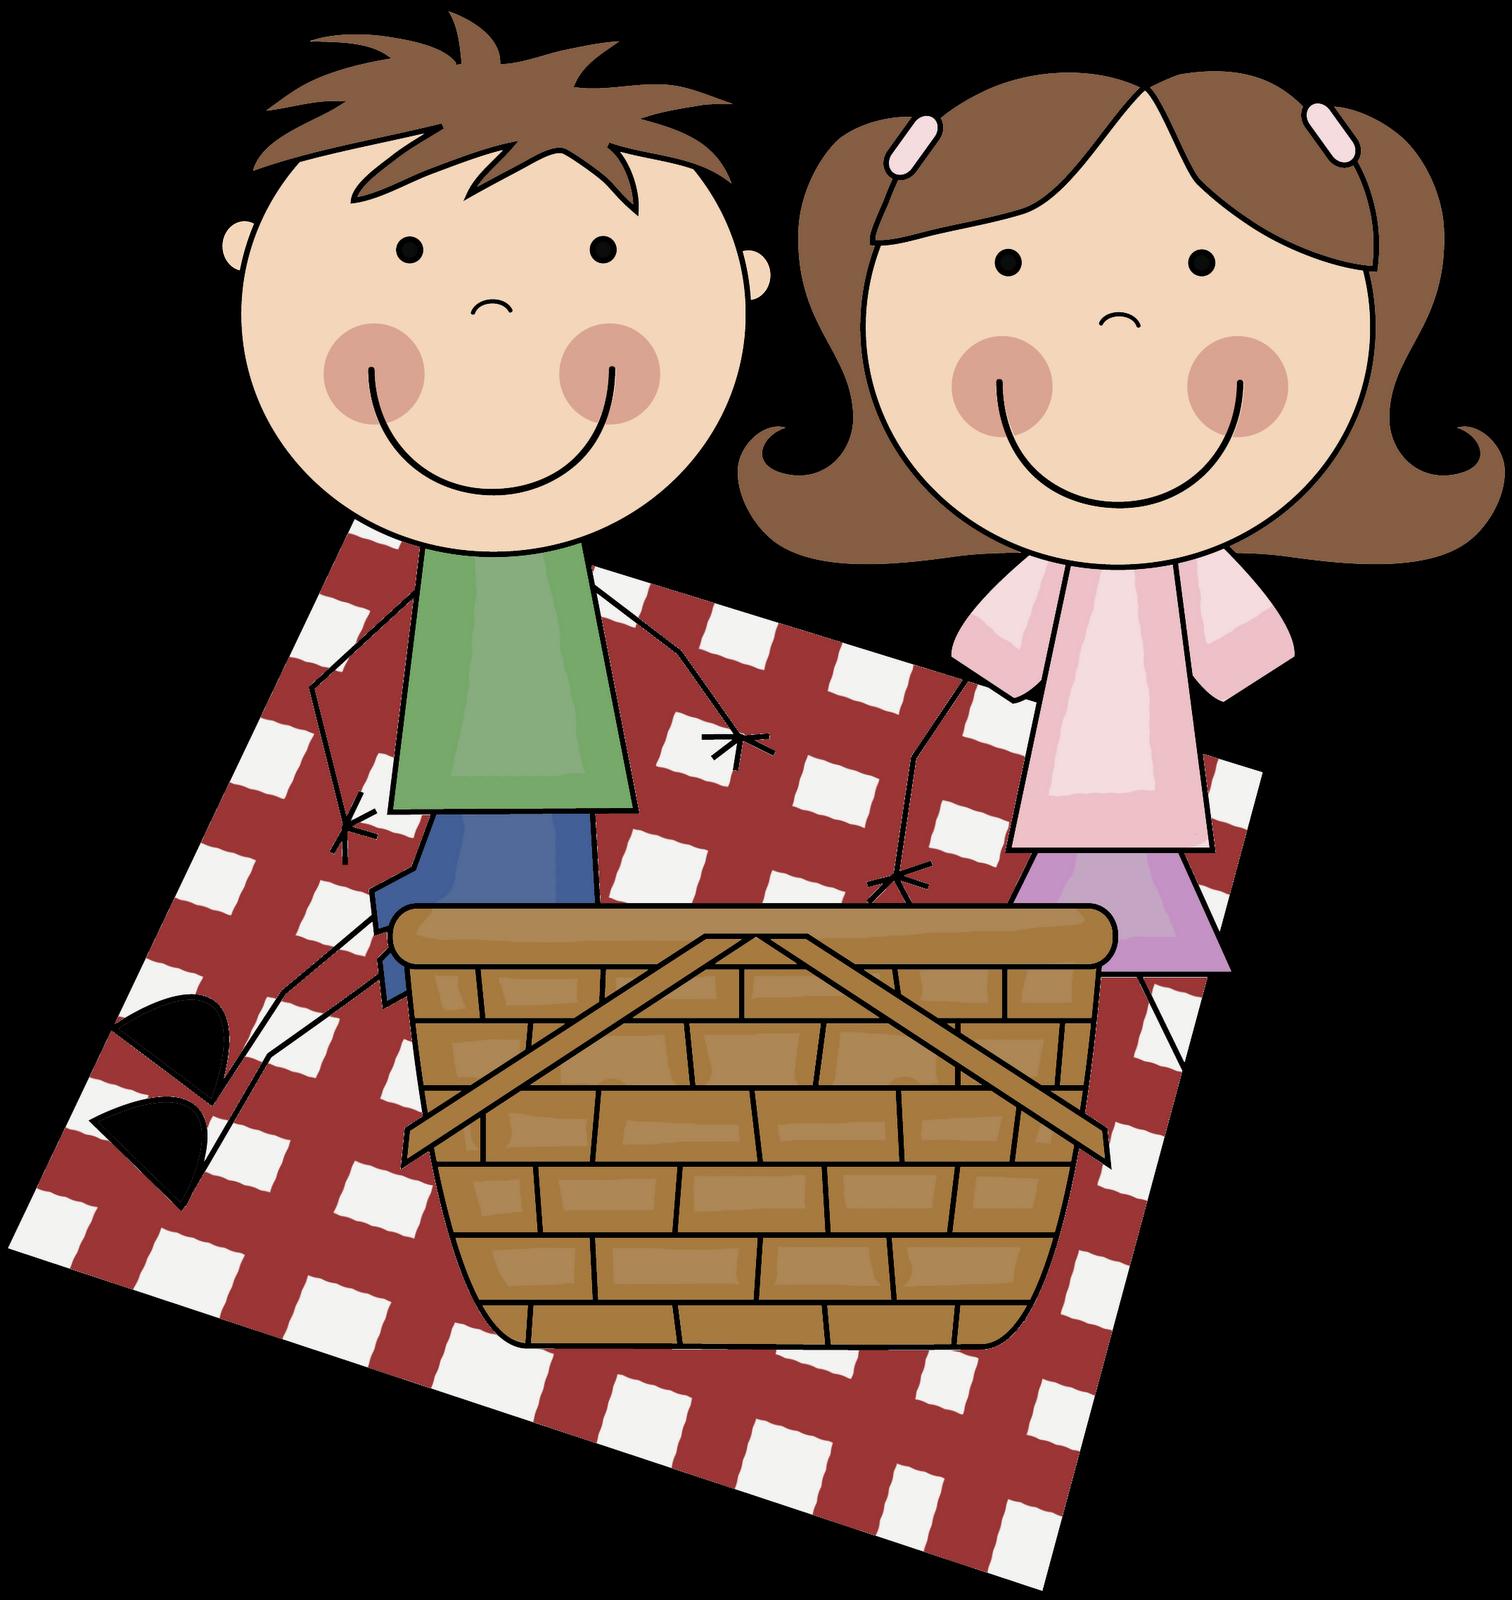 clipart transparent download Grandparent clipart picnic. Trinity classical academy ptf